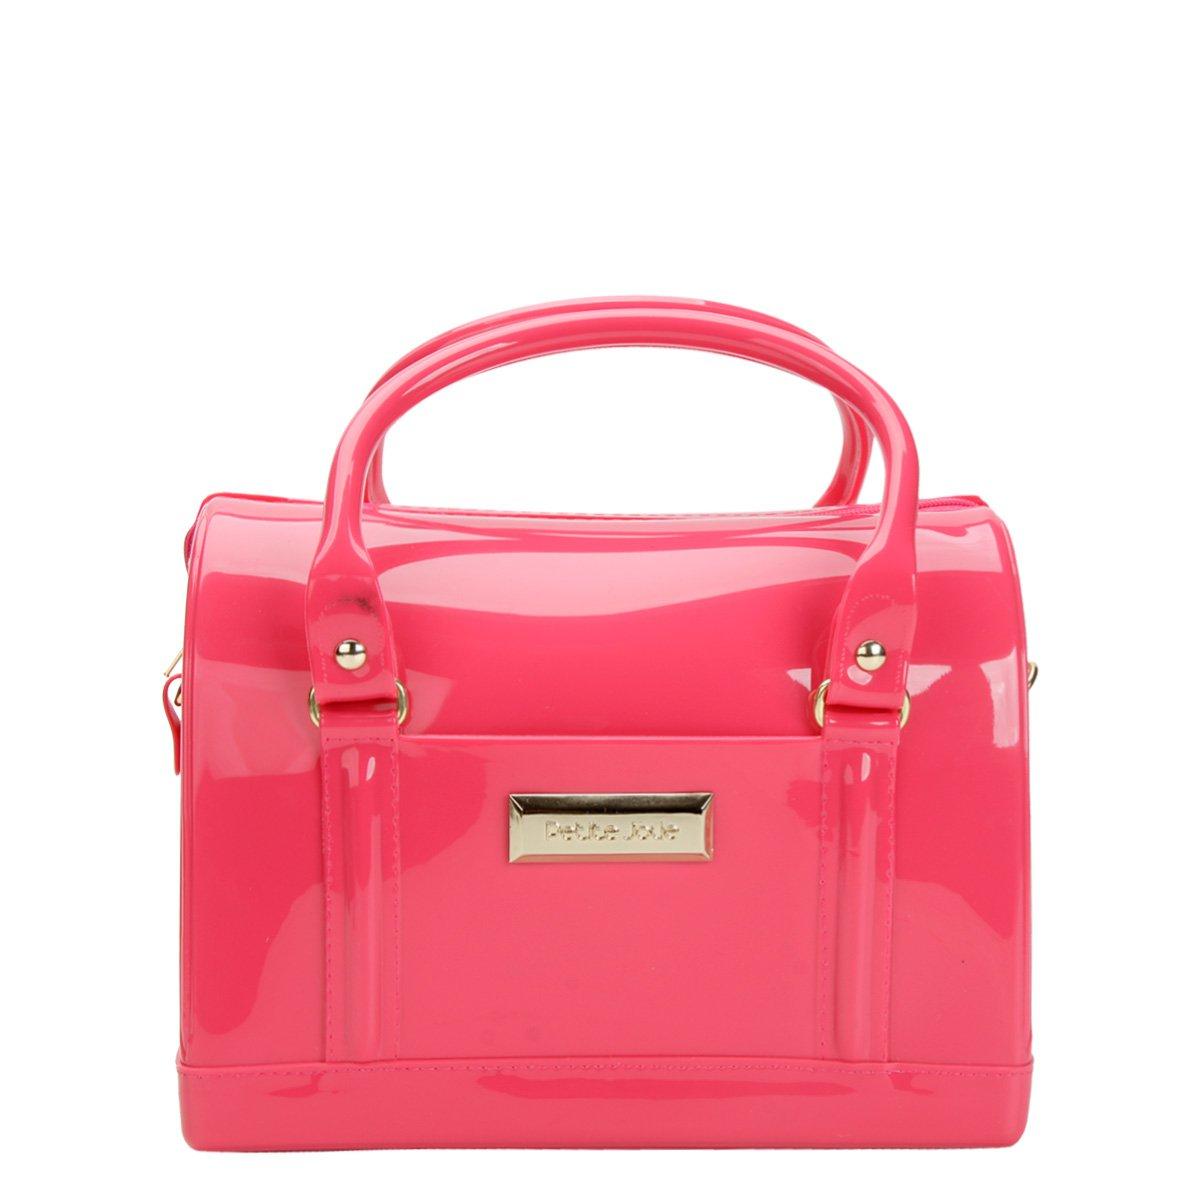 Bolsa De Mão Petite Jolie : Bolsa petite jolie ba? bloom feminina pink